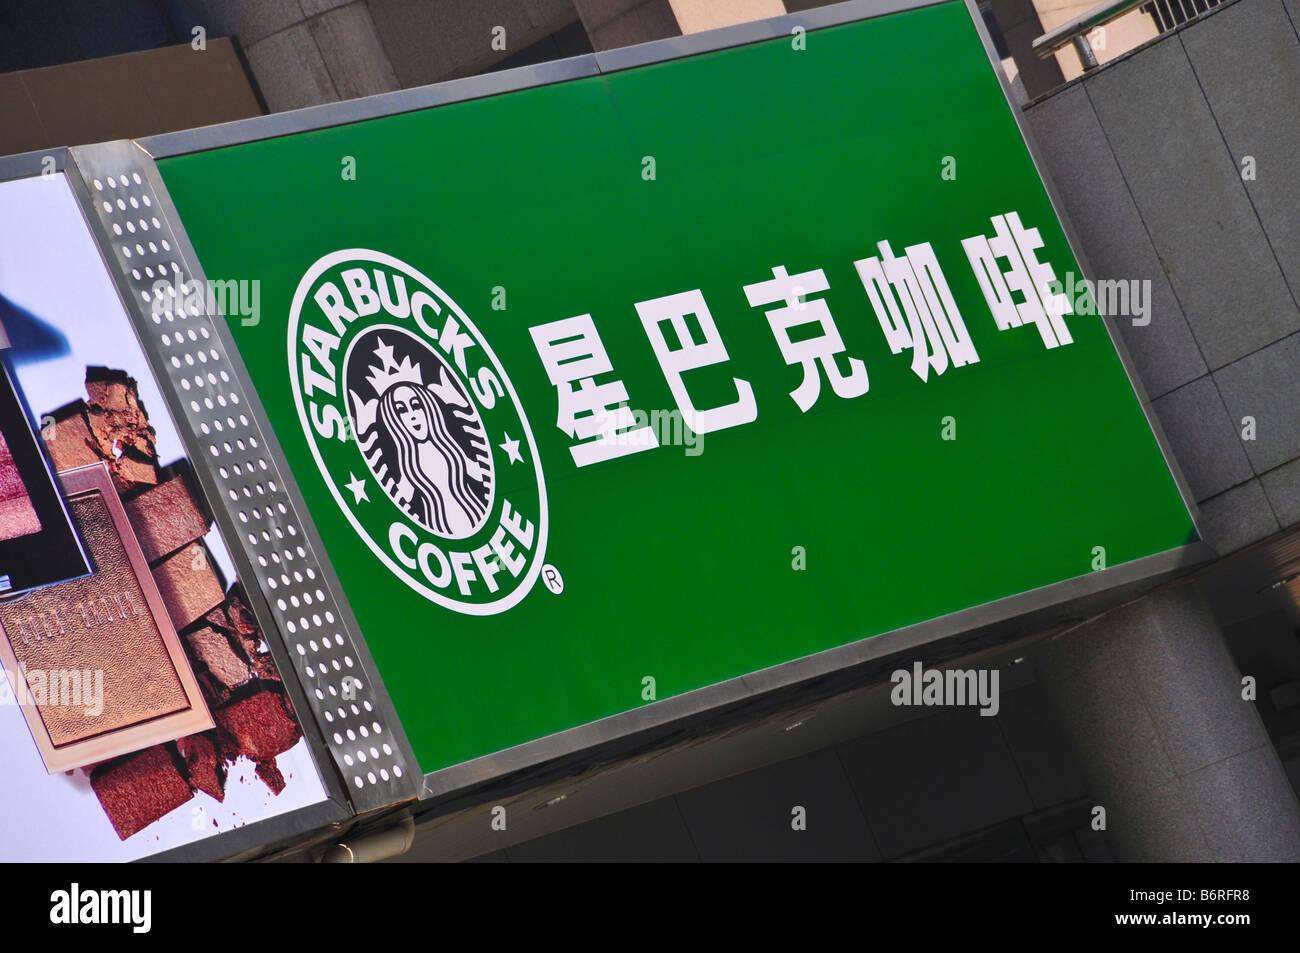 Starbucks cafe Beijing China - Stock Image